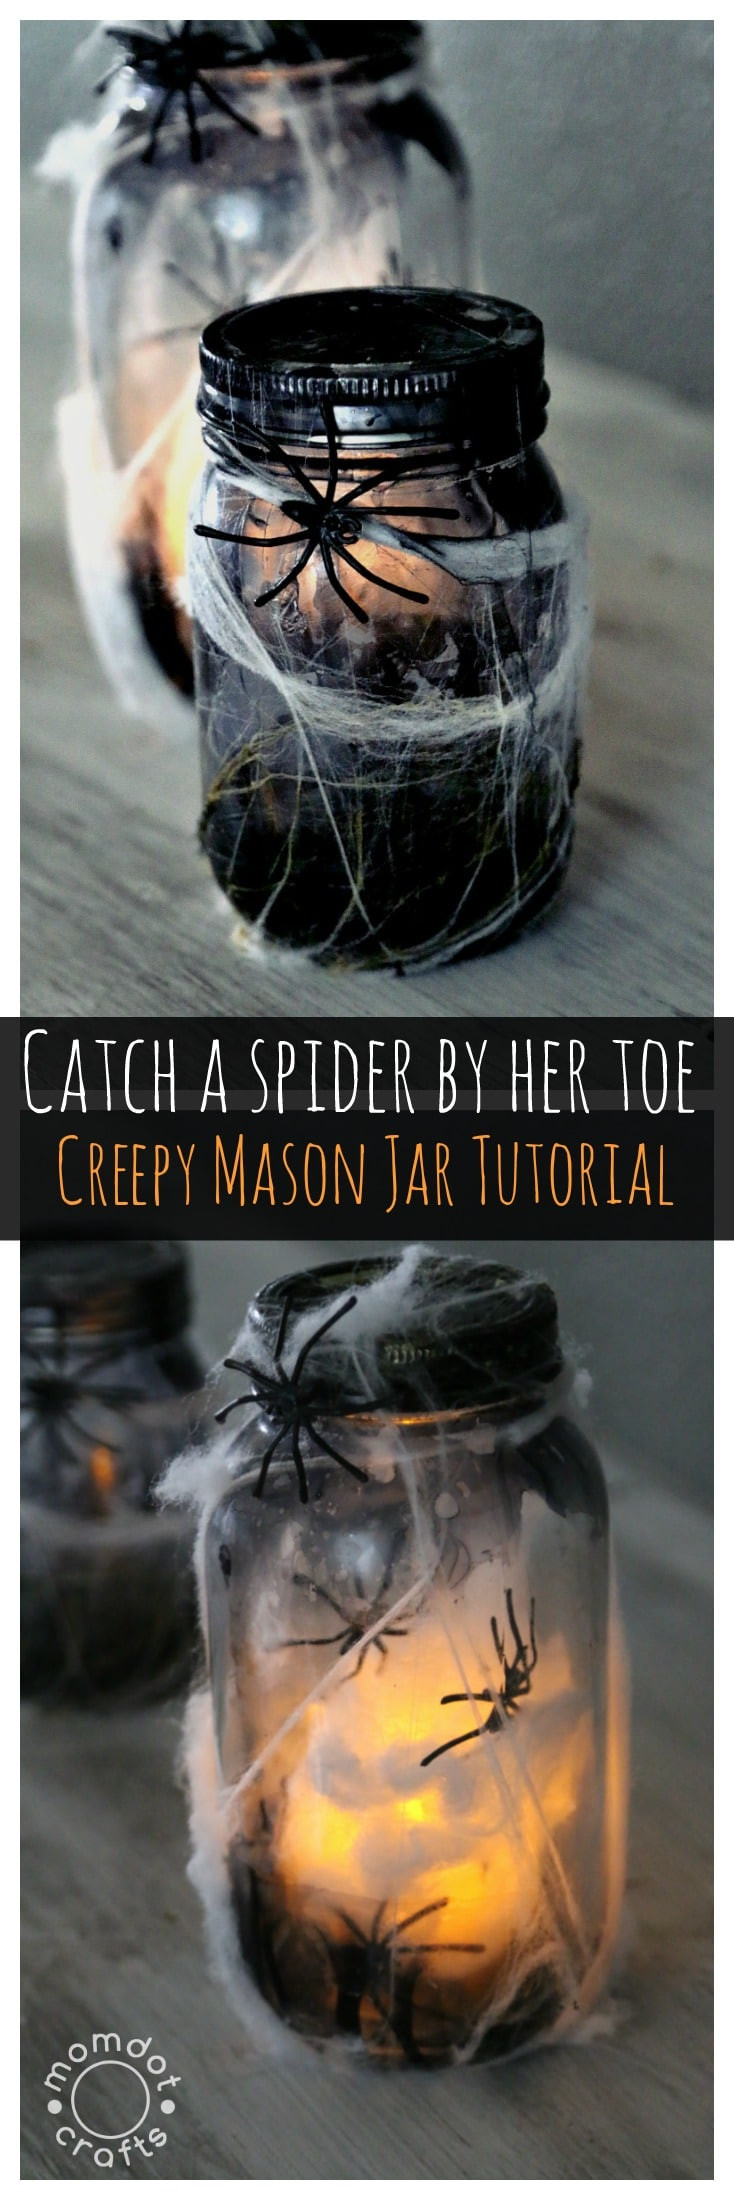 Halloween Mason Jar Crafts: Tutorial on how to make a creepy light up spider jar for halloween decor, center pieces or scary bathroom night light